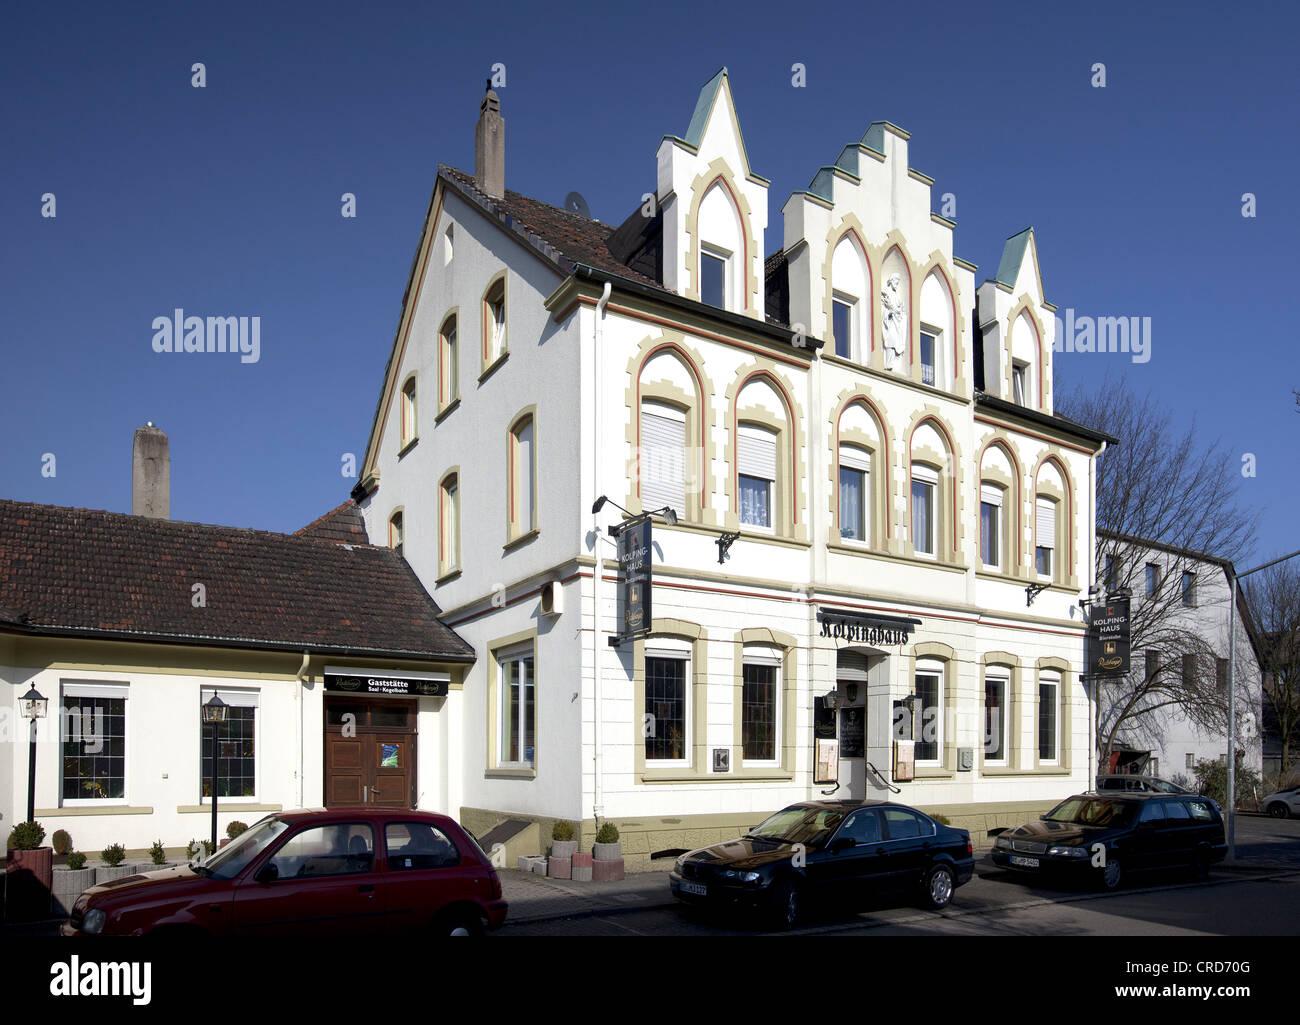 Kolping House, Herten, Westerholt district, Ruhr Area, North Rhine-Westphalia, Germany, Europe, PublicGround - Stock Image